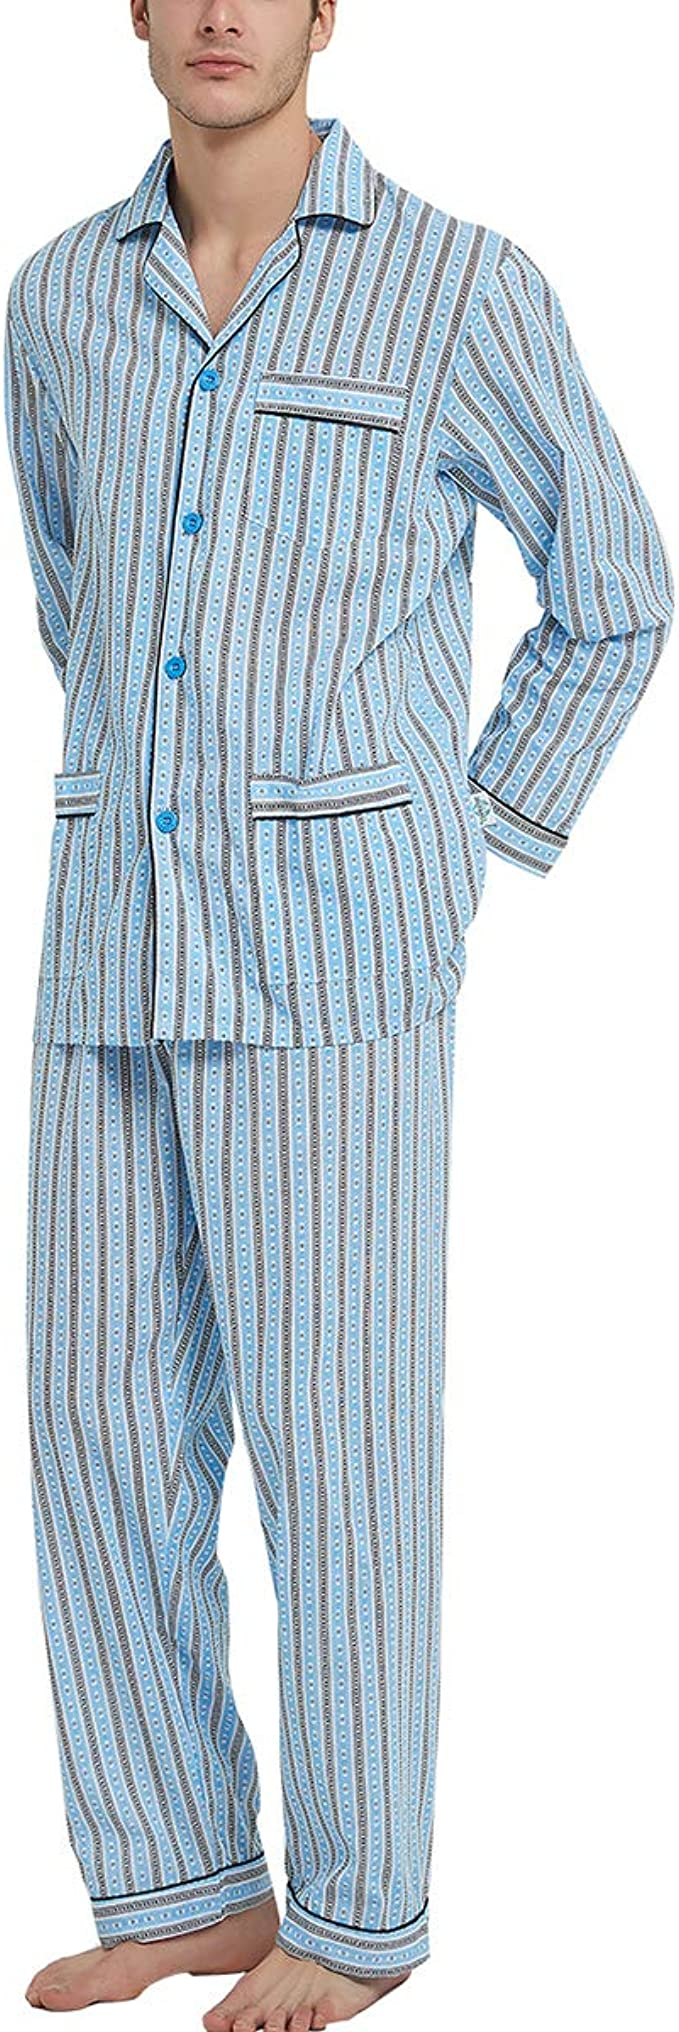 Nicelly Mens Warm Autumn 2 Piece Set Stripes Printed Pajama Lounge Set